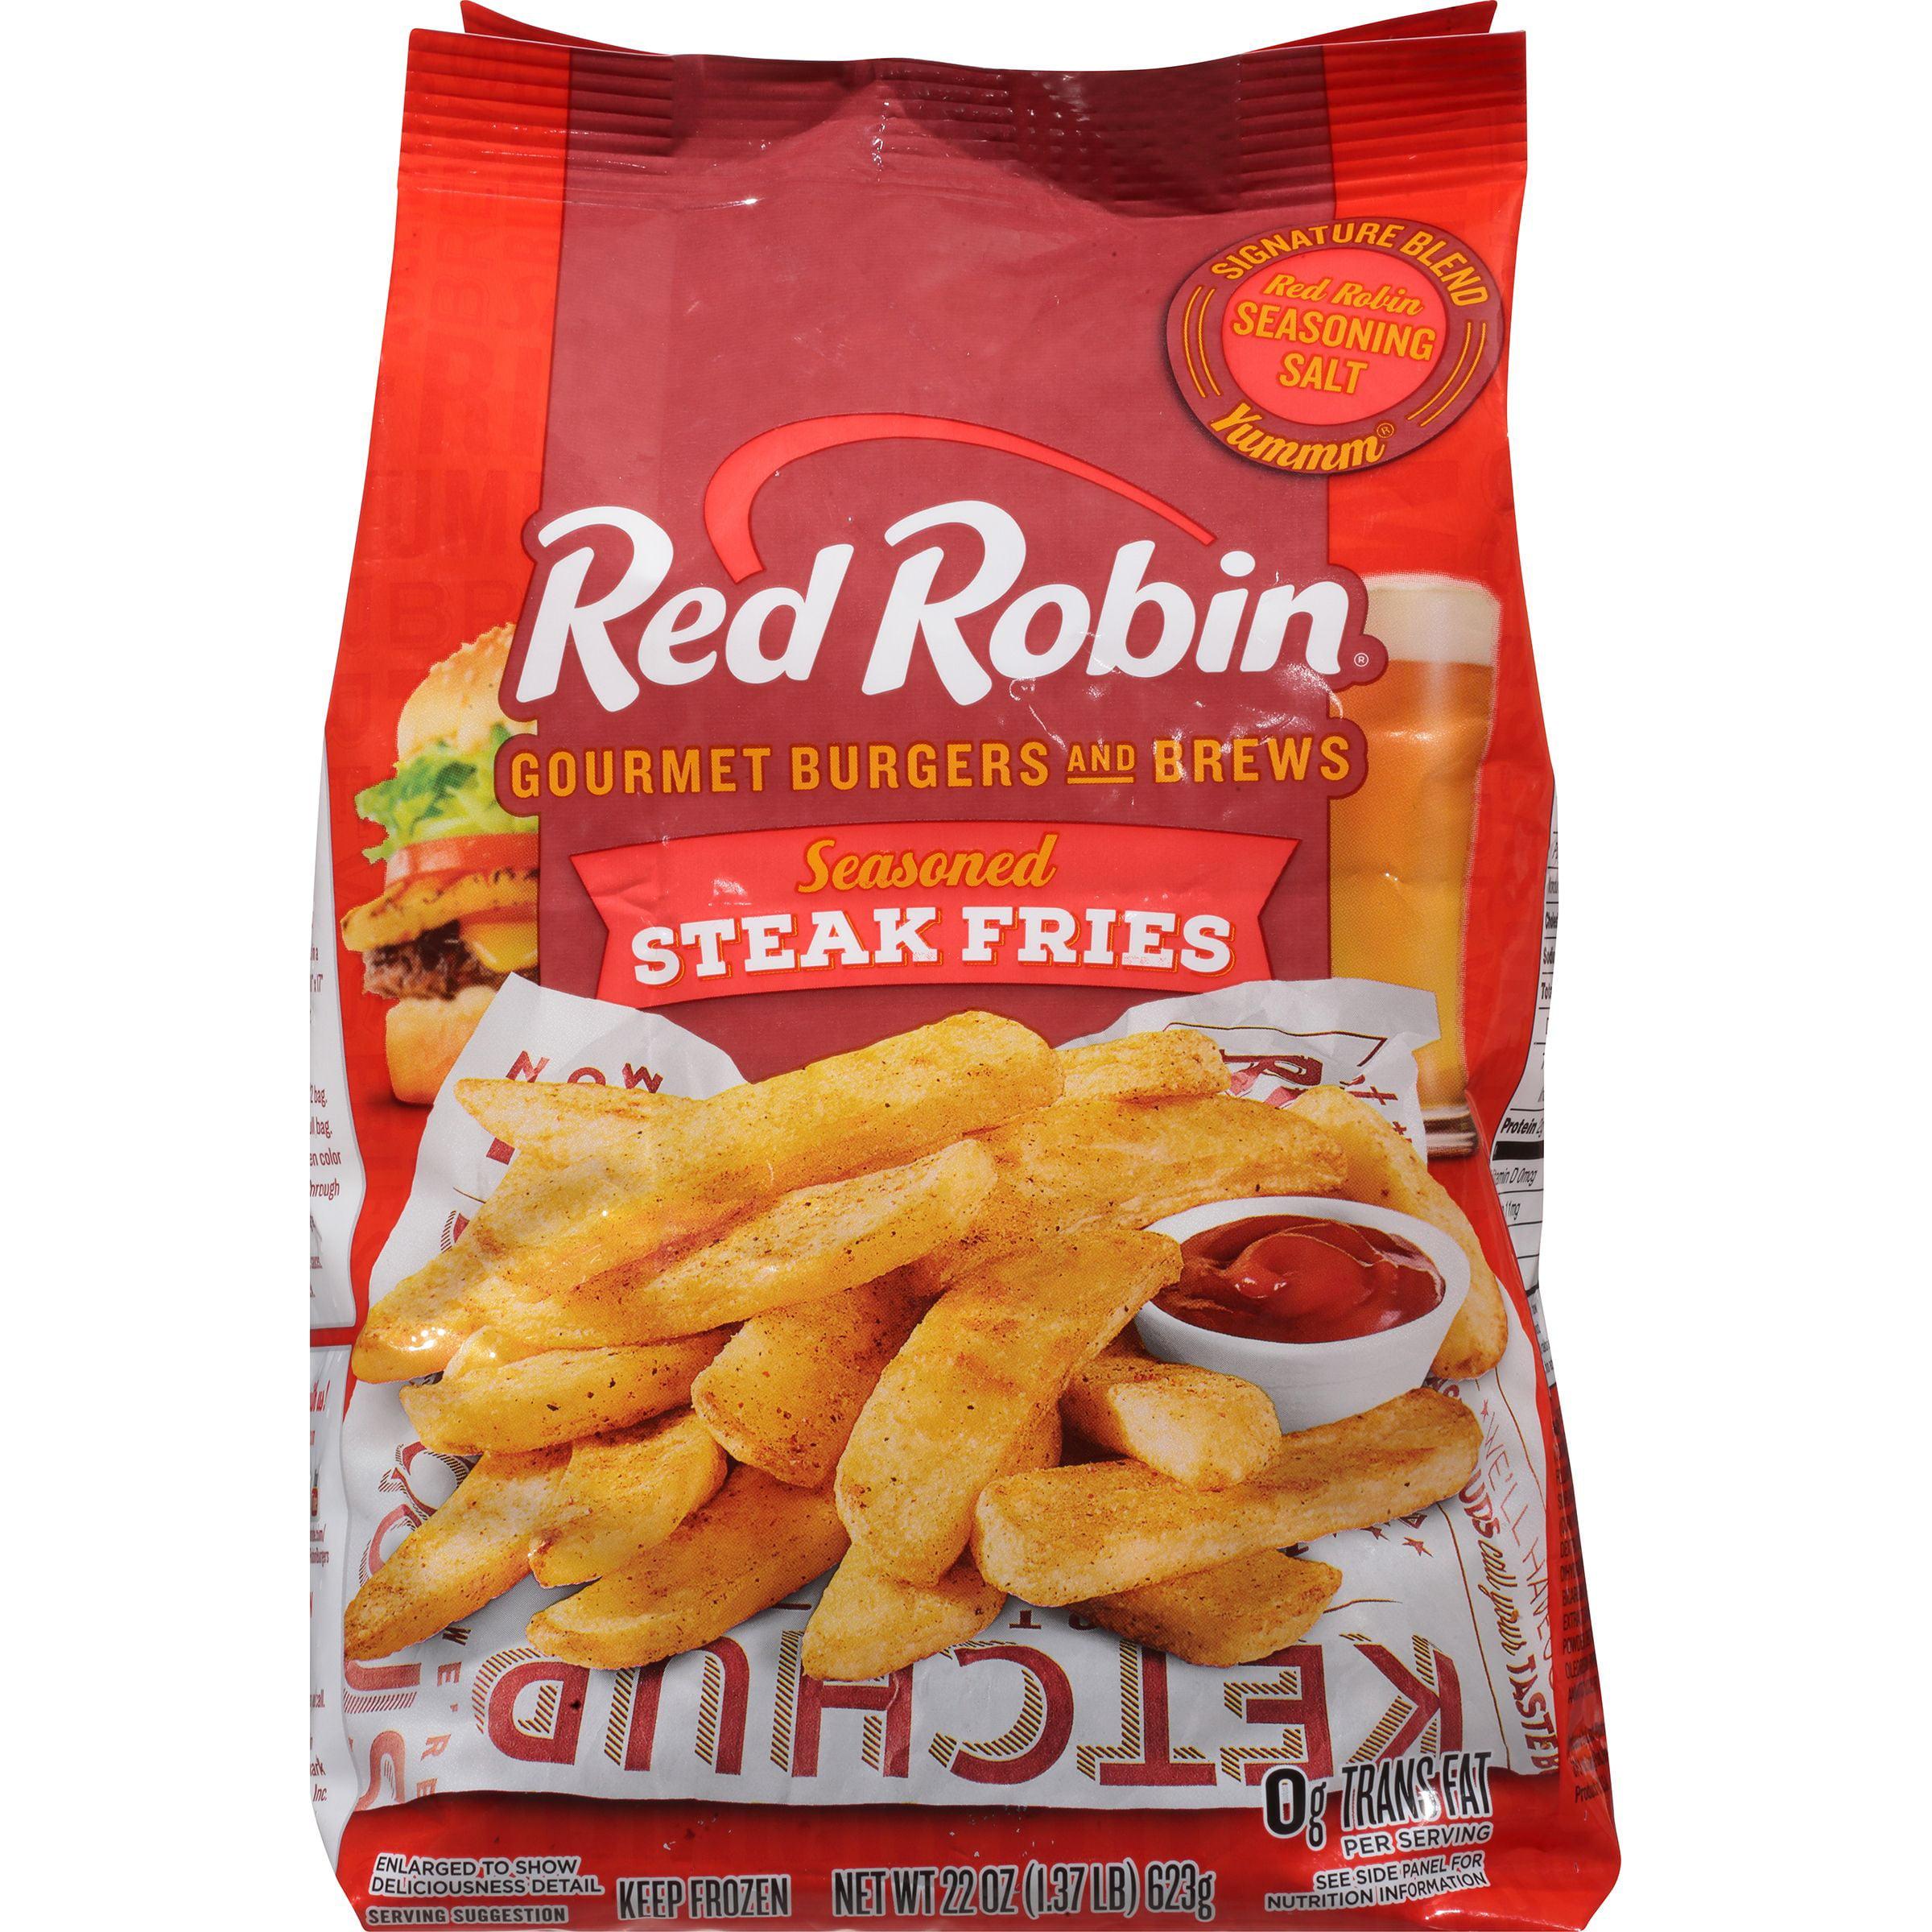 Red Robin Seasoned Steak Fries, 22 oz